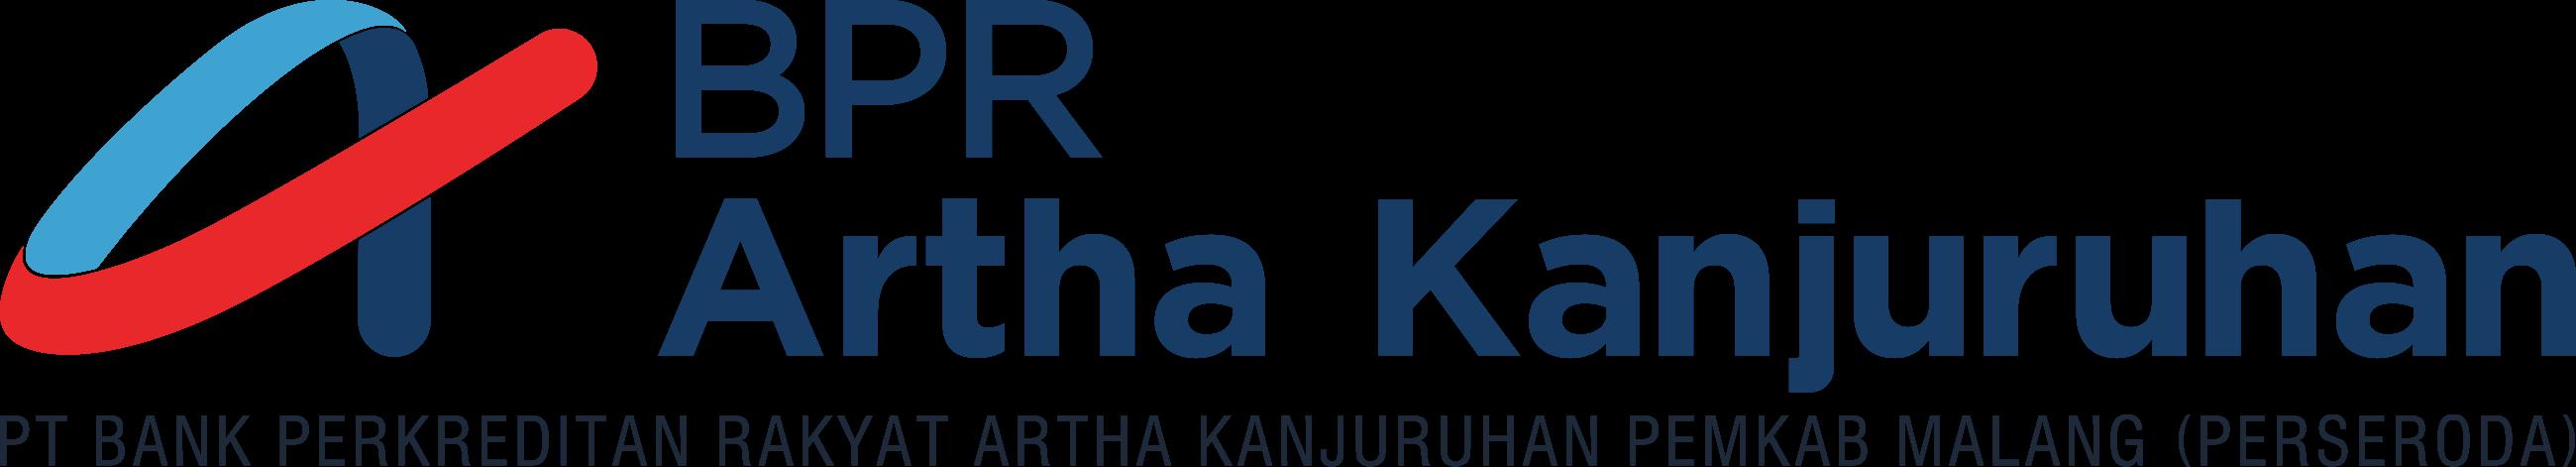 BPR Artha Kanjuruhan